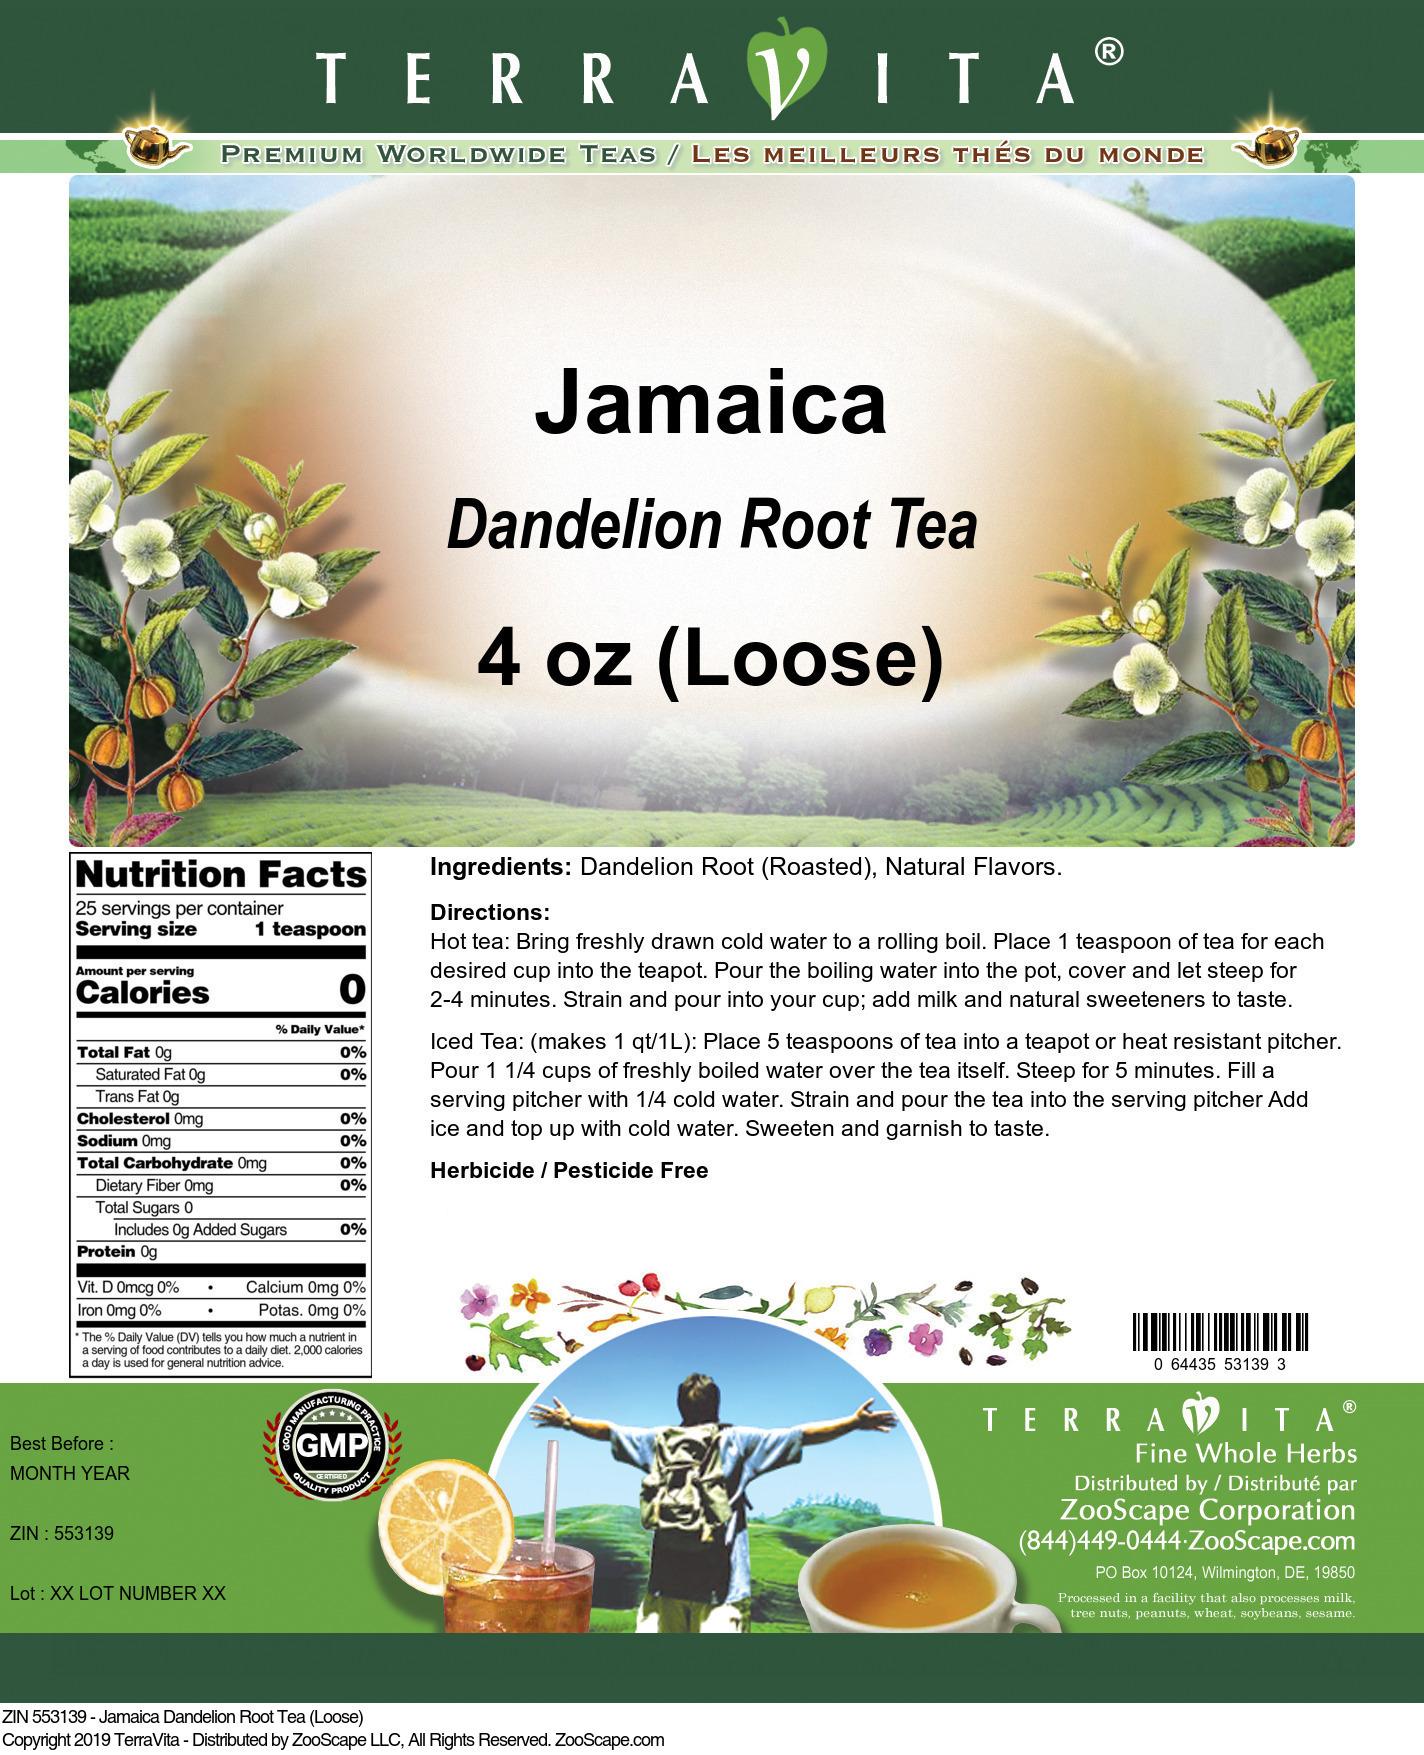 Jamaica Dandelion Root Tea (Loose)